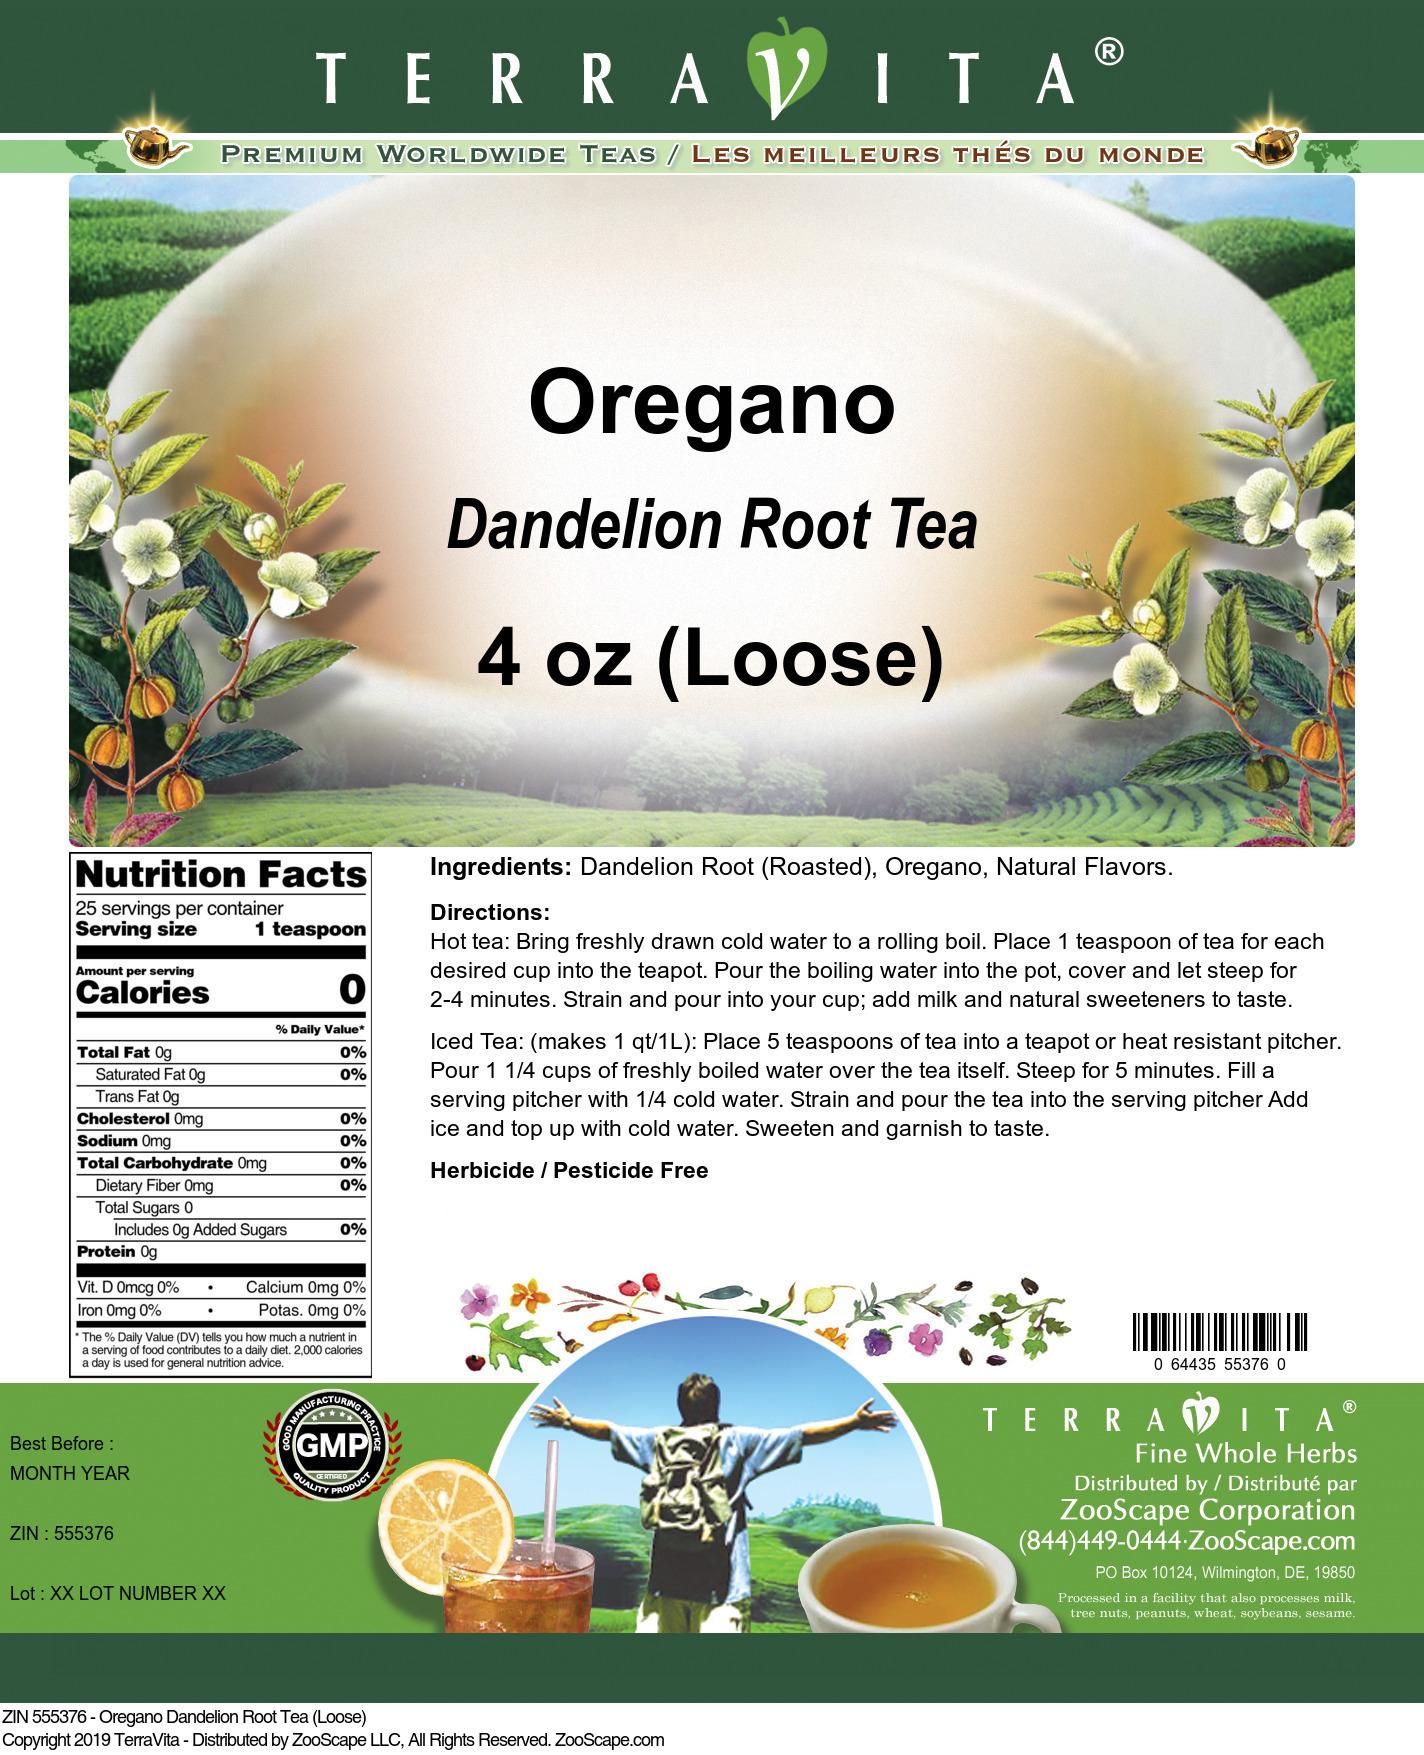 Oregano Dandelion Root